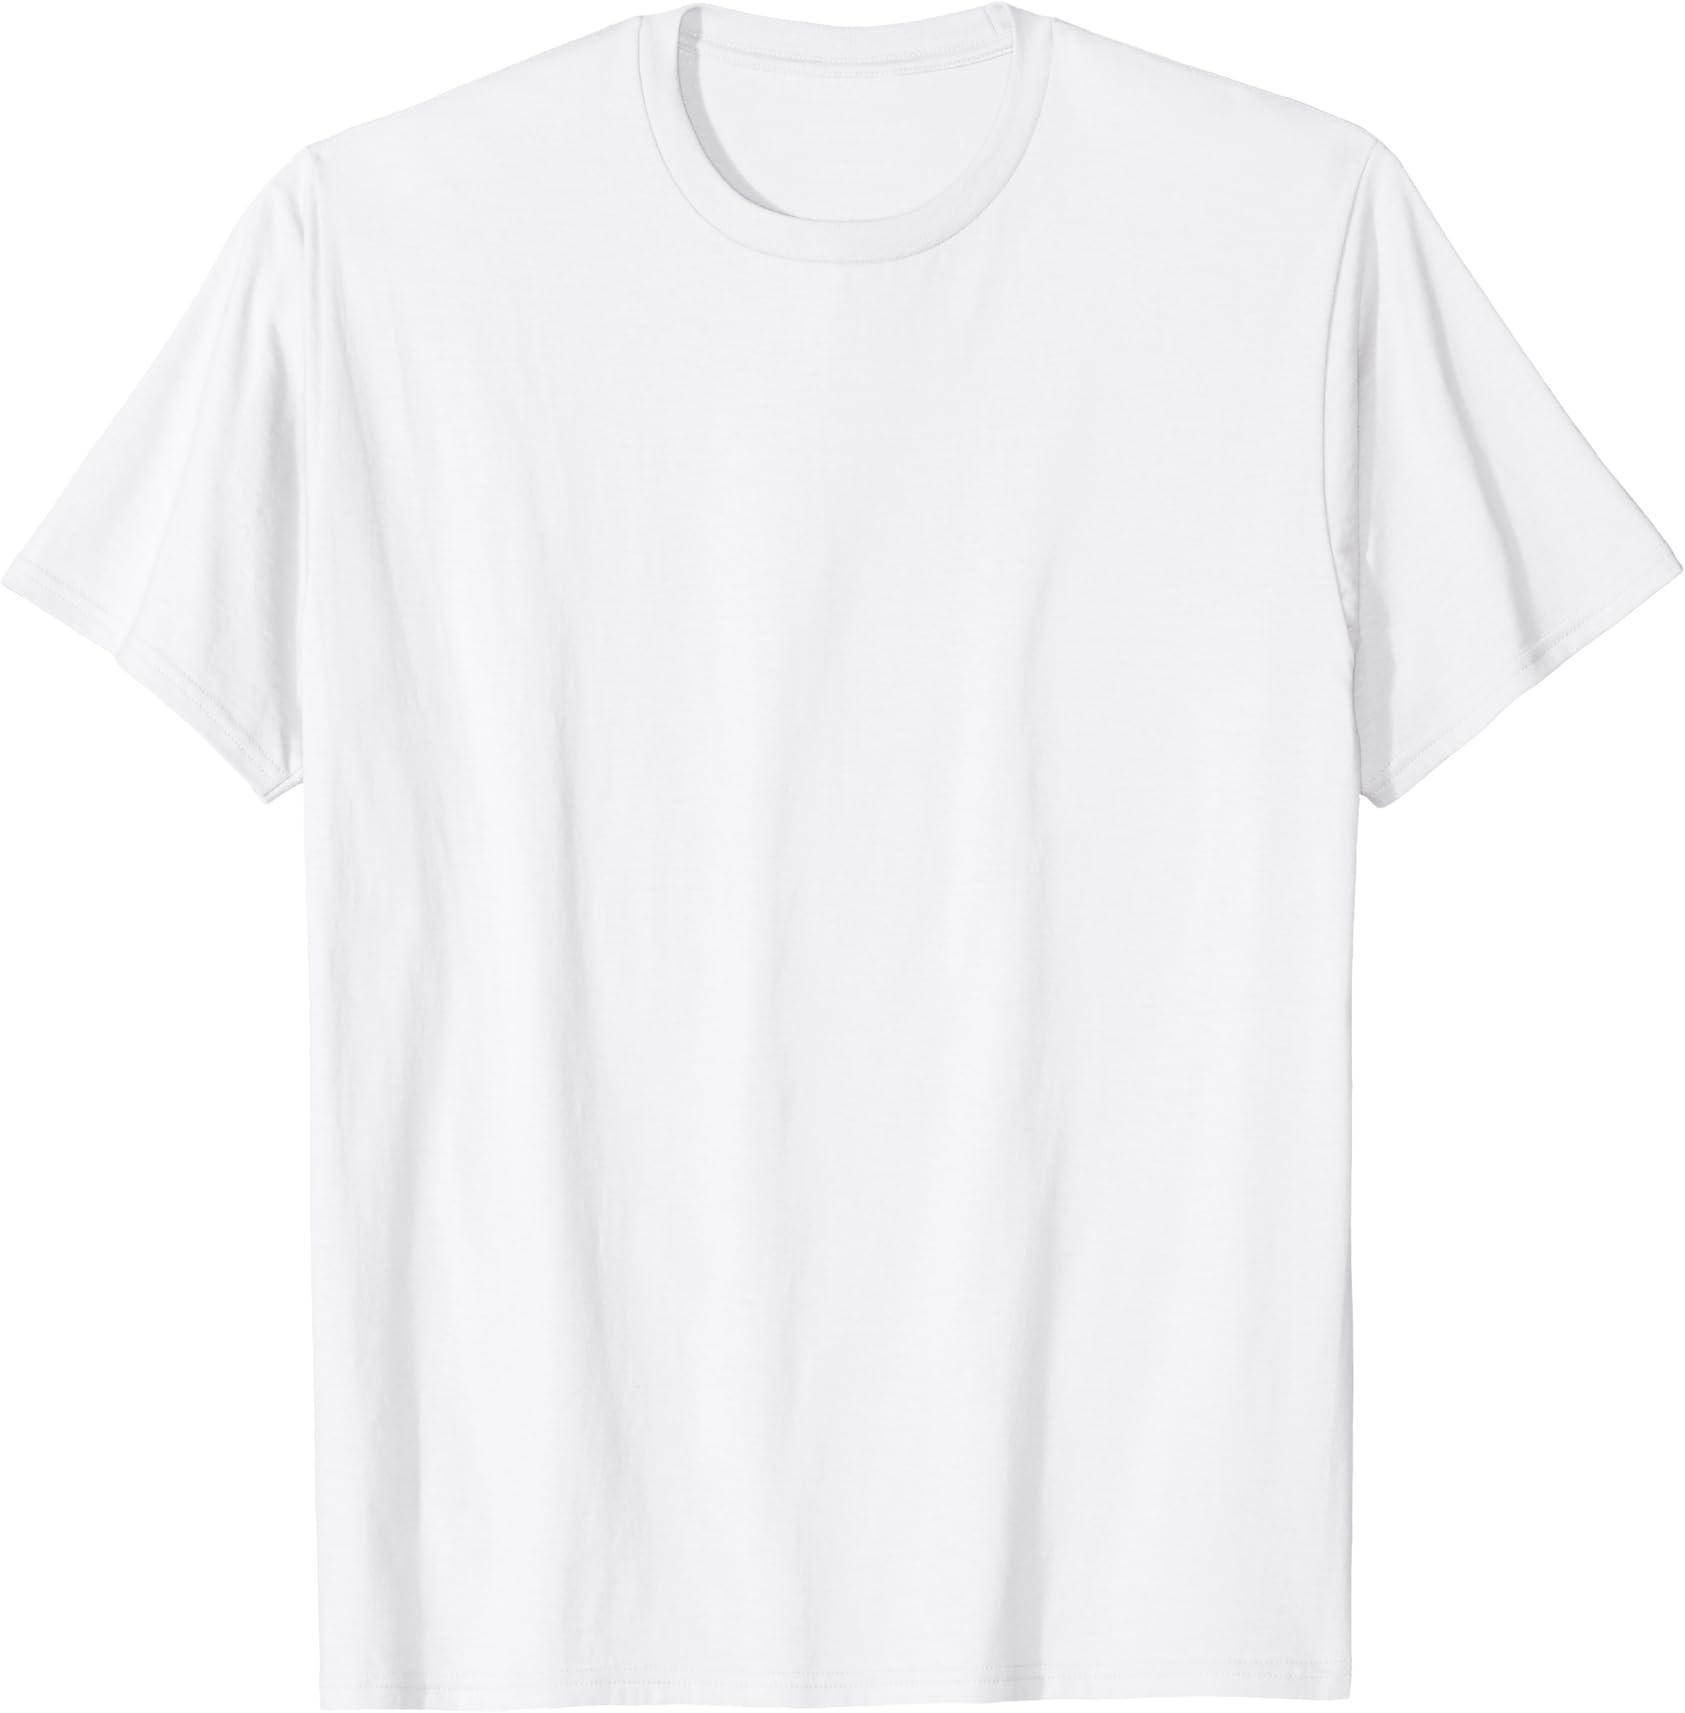 Made in USA Vegas Vintage Eagle T-Shirt